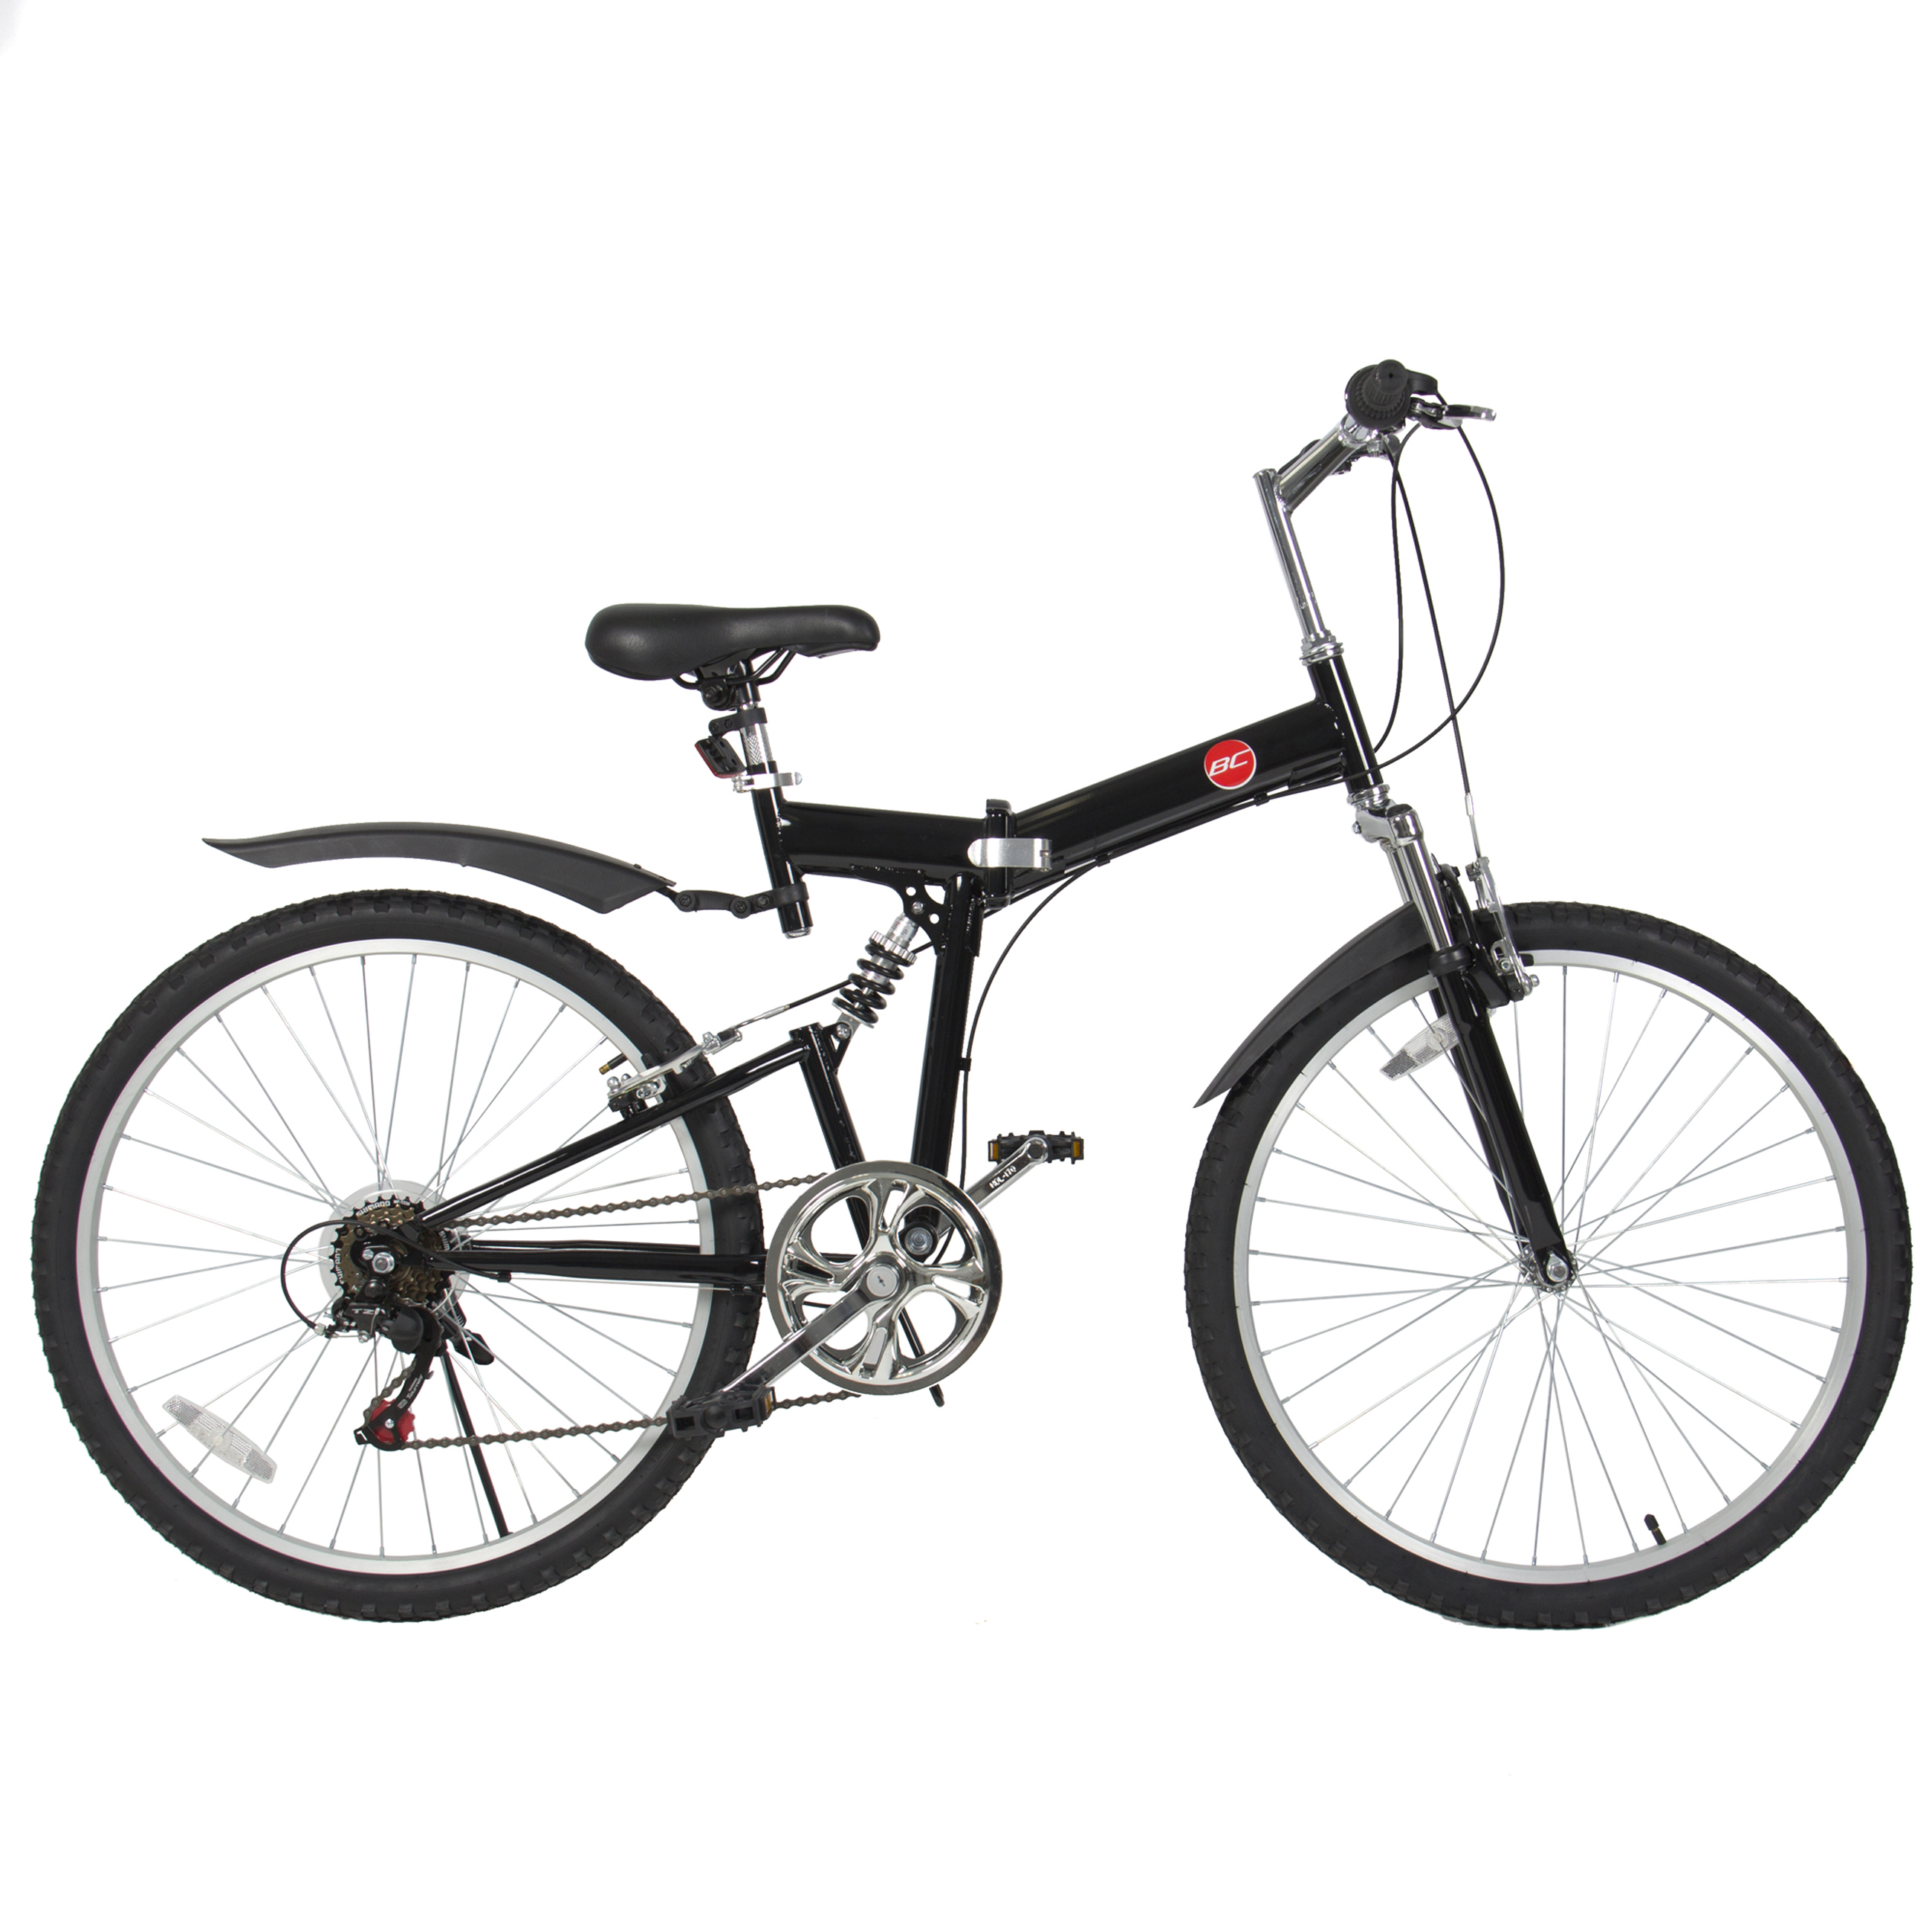 26 Folding Mountain Bicycle 6 Speed Shimano Foldable Bike Black